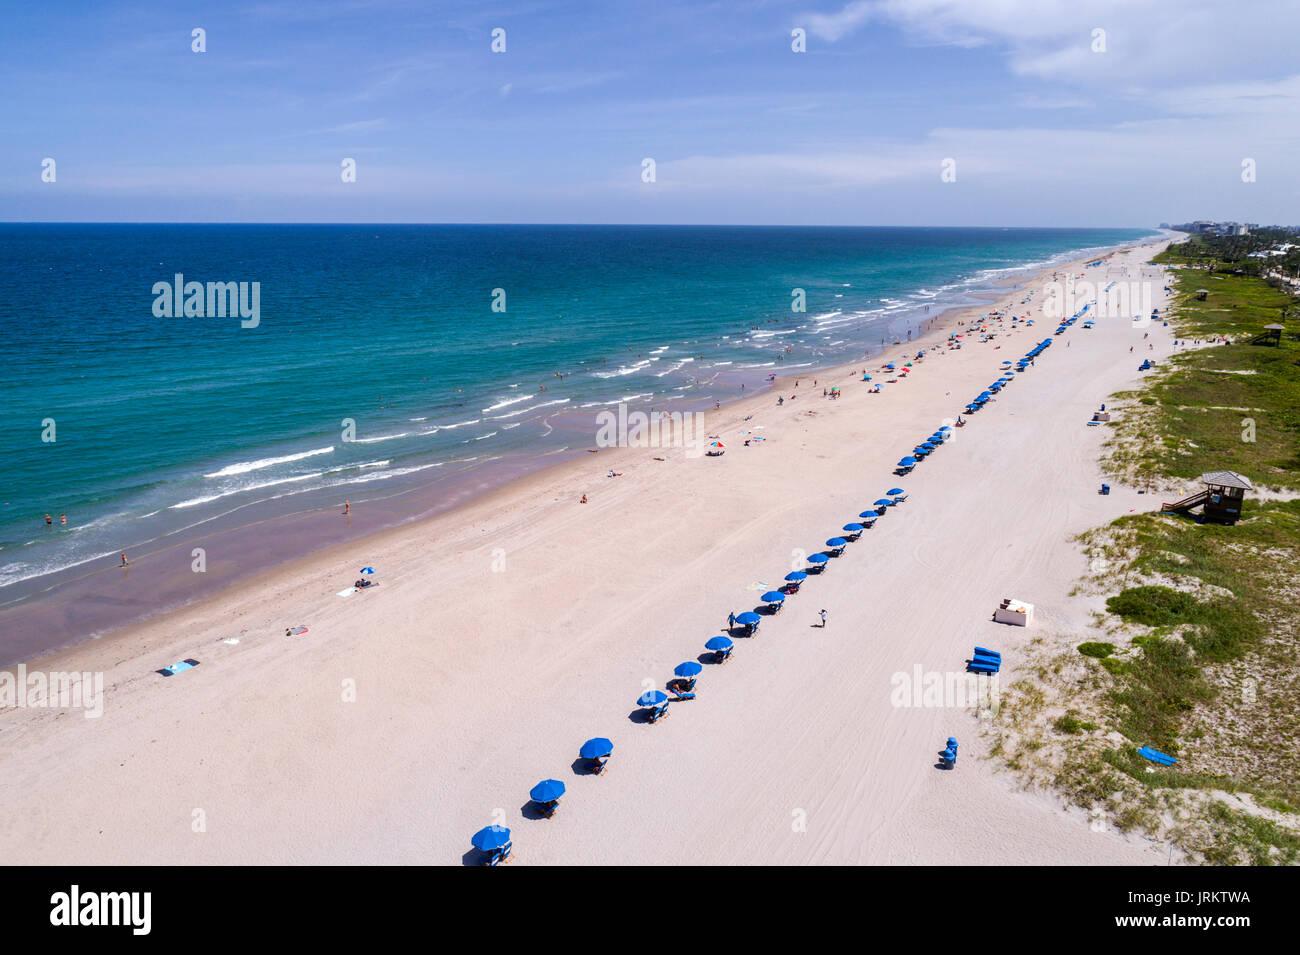 Florida Delray Beach Atlantic Ocean sand blue umbrellas aerial overhead view bird's eye above sunbathers - Stock Image